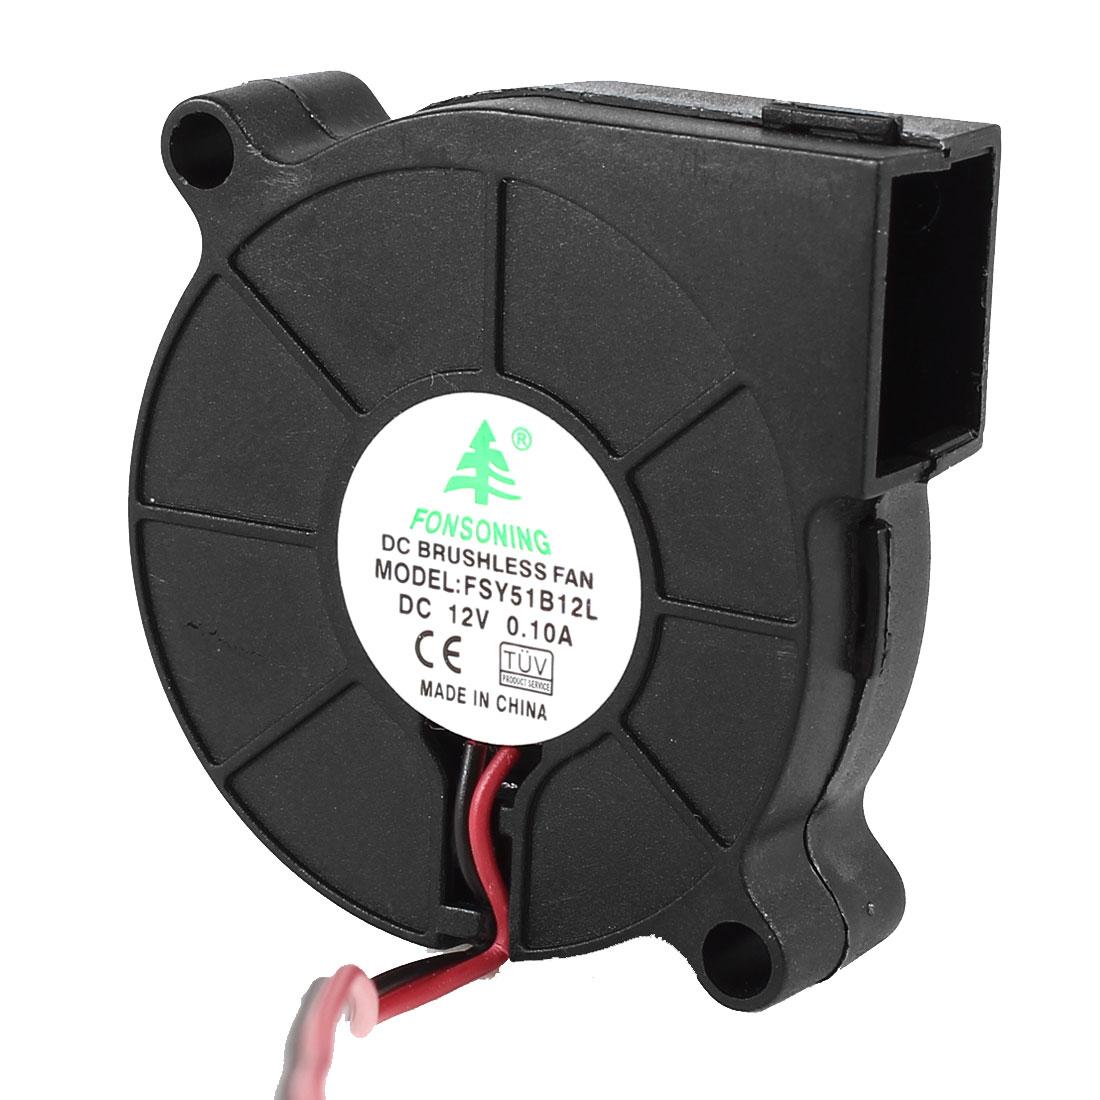 FSY51B12L 50x15mm 5015B Brushless DC Cooling Blower Fan 12V 0.10A